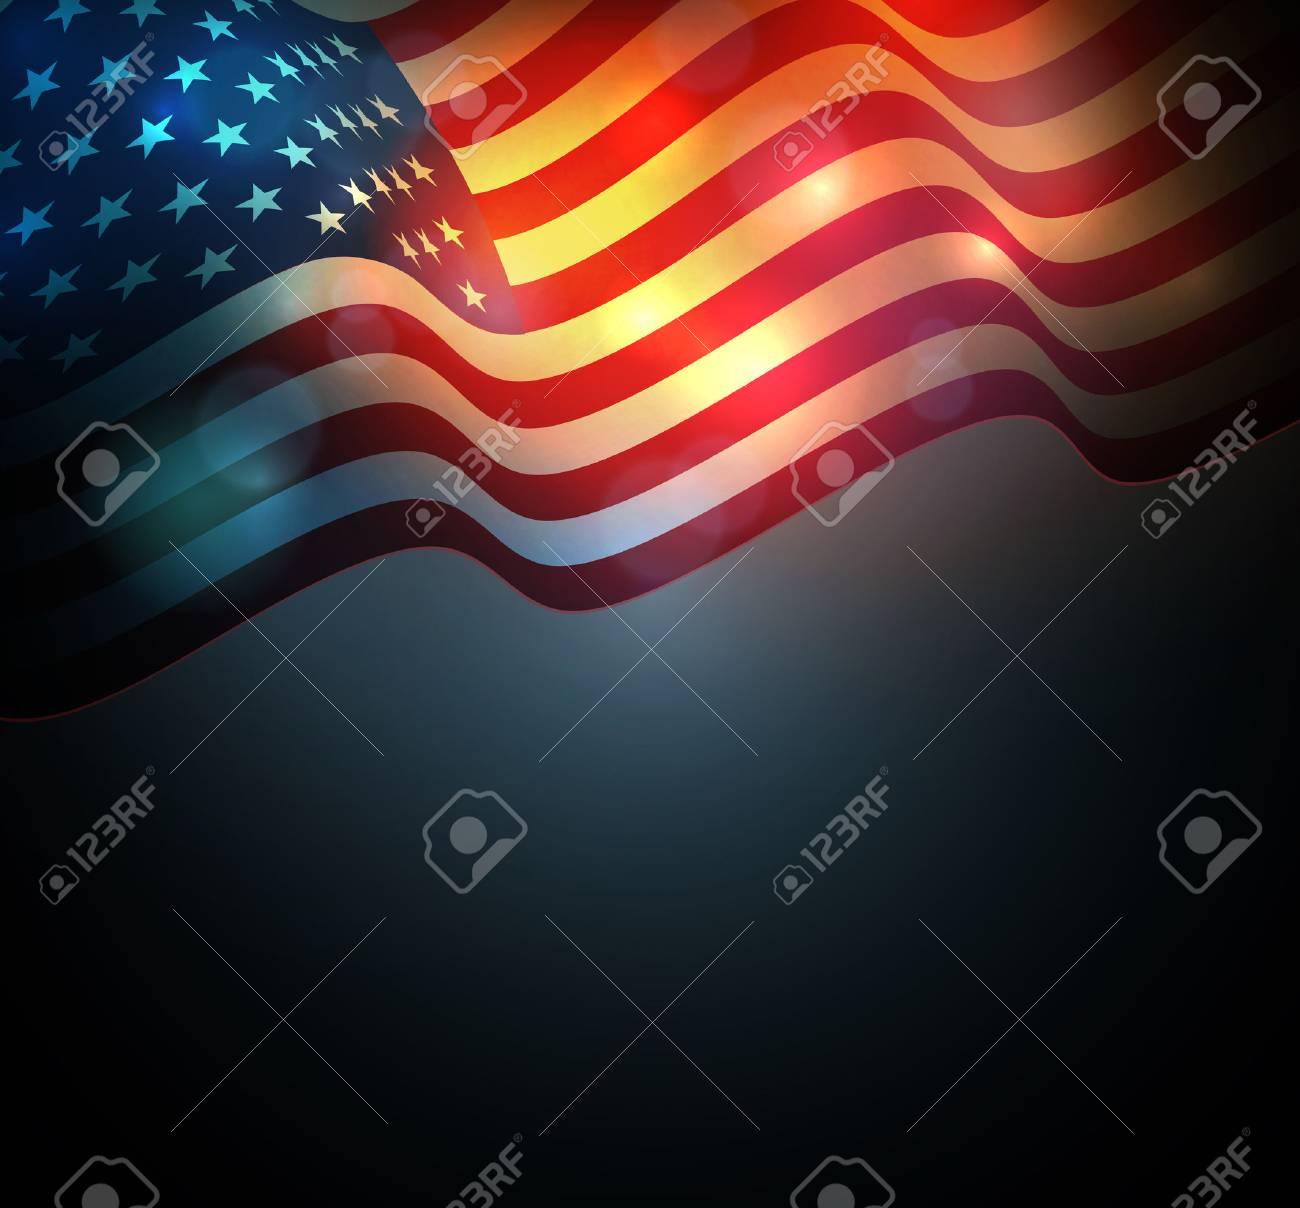 United States flag. USA Independence Day background. Fourth of July celebrate - 54493451